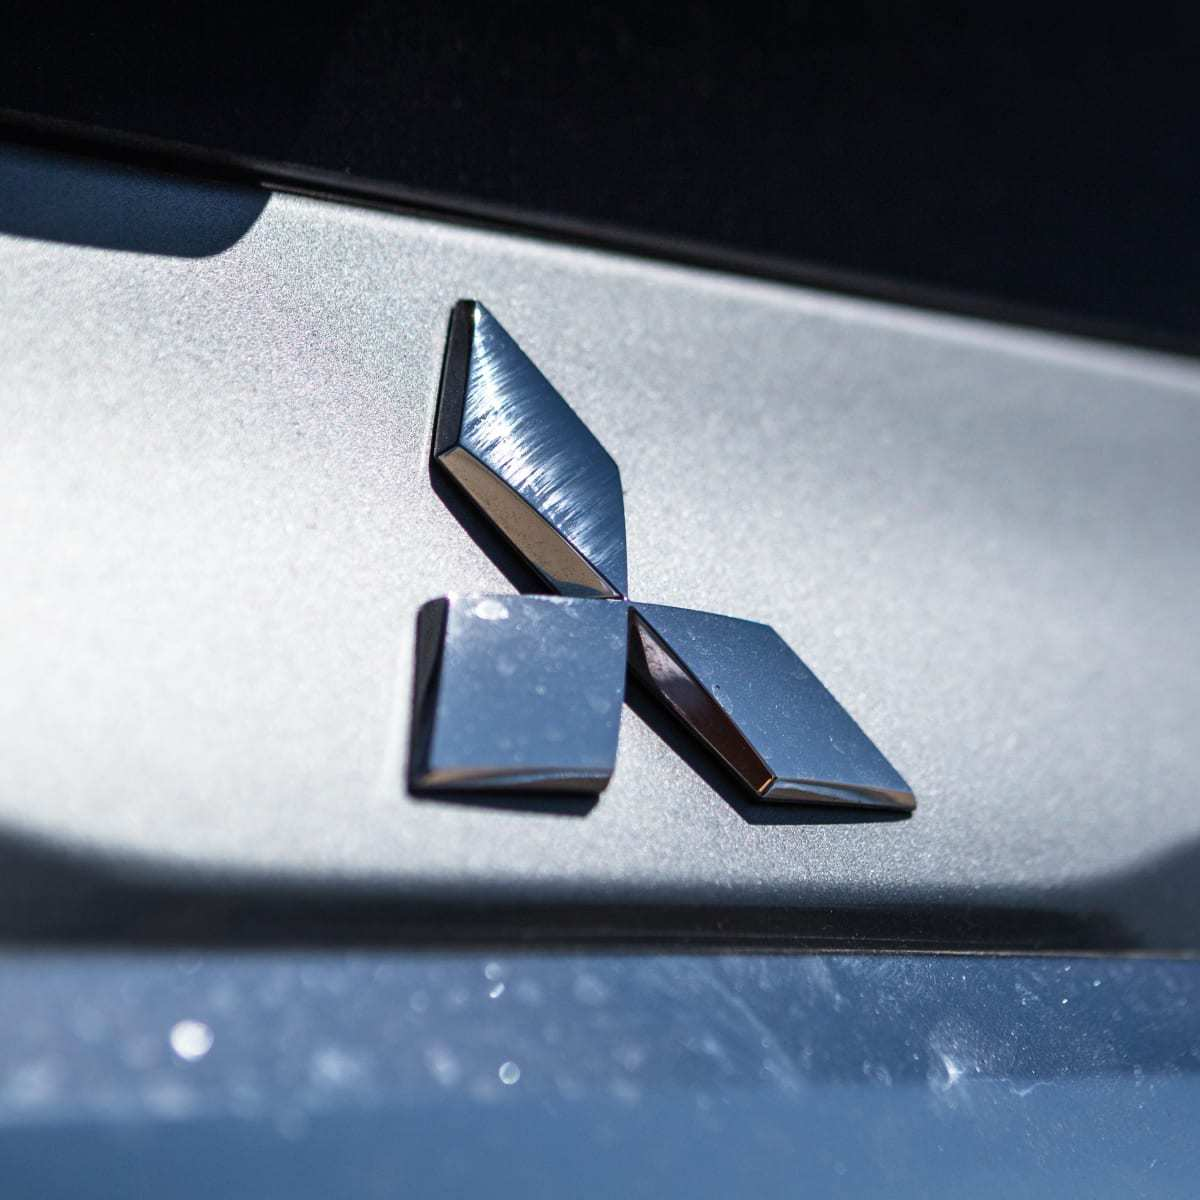 78 Great Neue Mitsubishi Modelle Bis 2020 Performance by Neue Mitsubishi Modelle Bis 2020